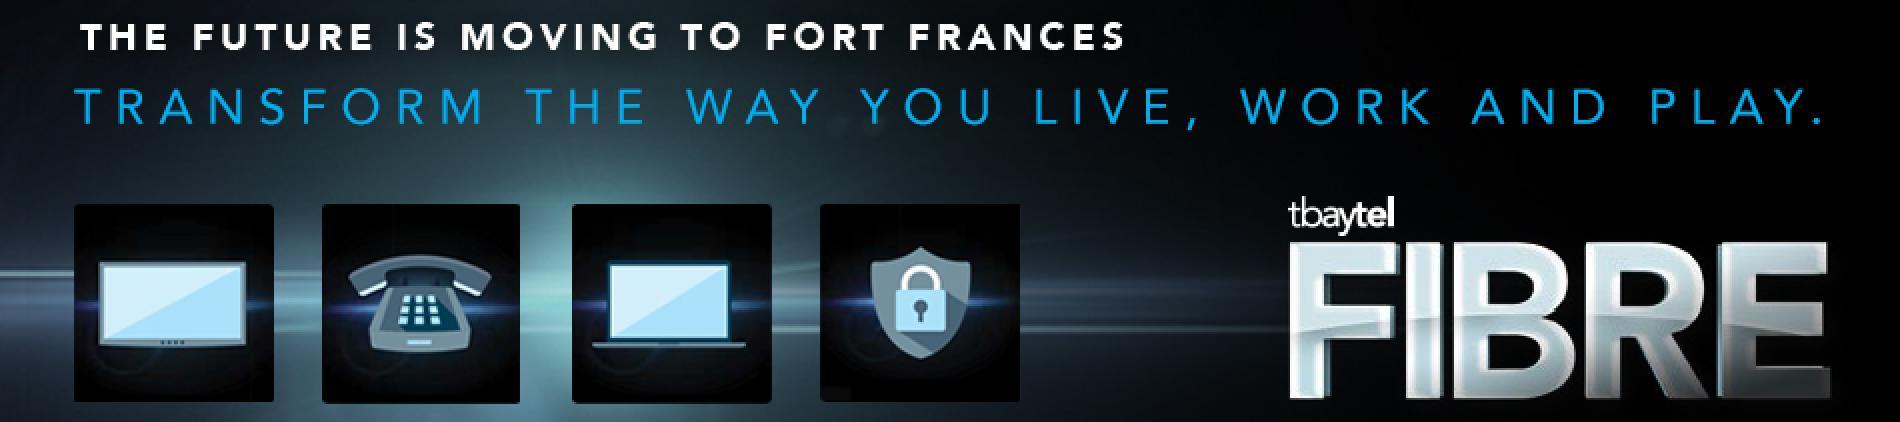 FIBER Fort Frances, Tbaytel, Digital TV, Fiber Internet, Fibe